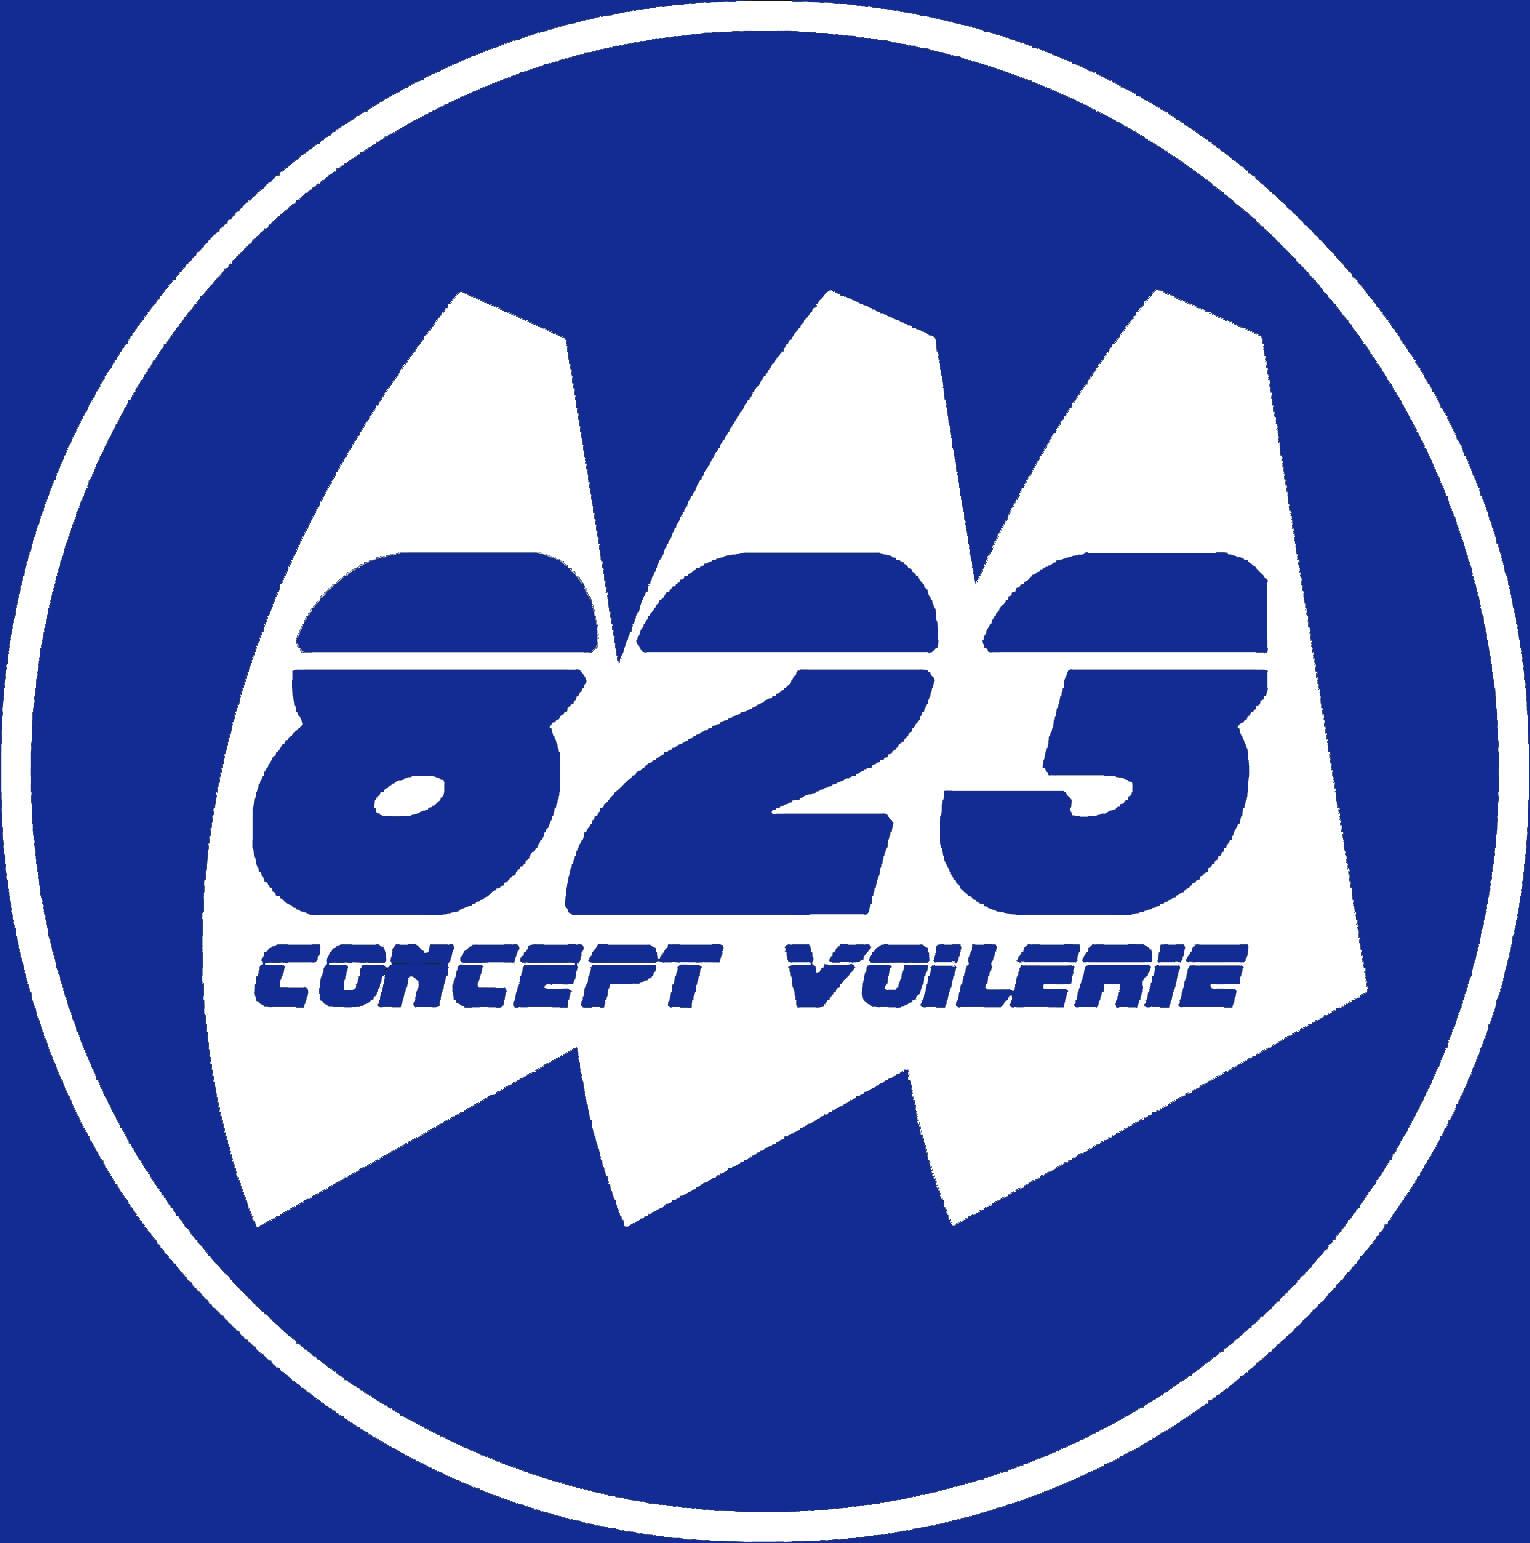 Voilerie 823 Concept